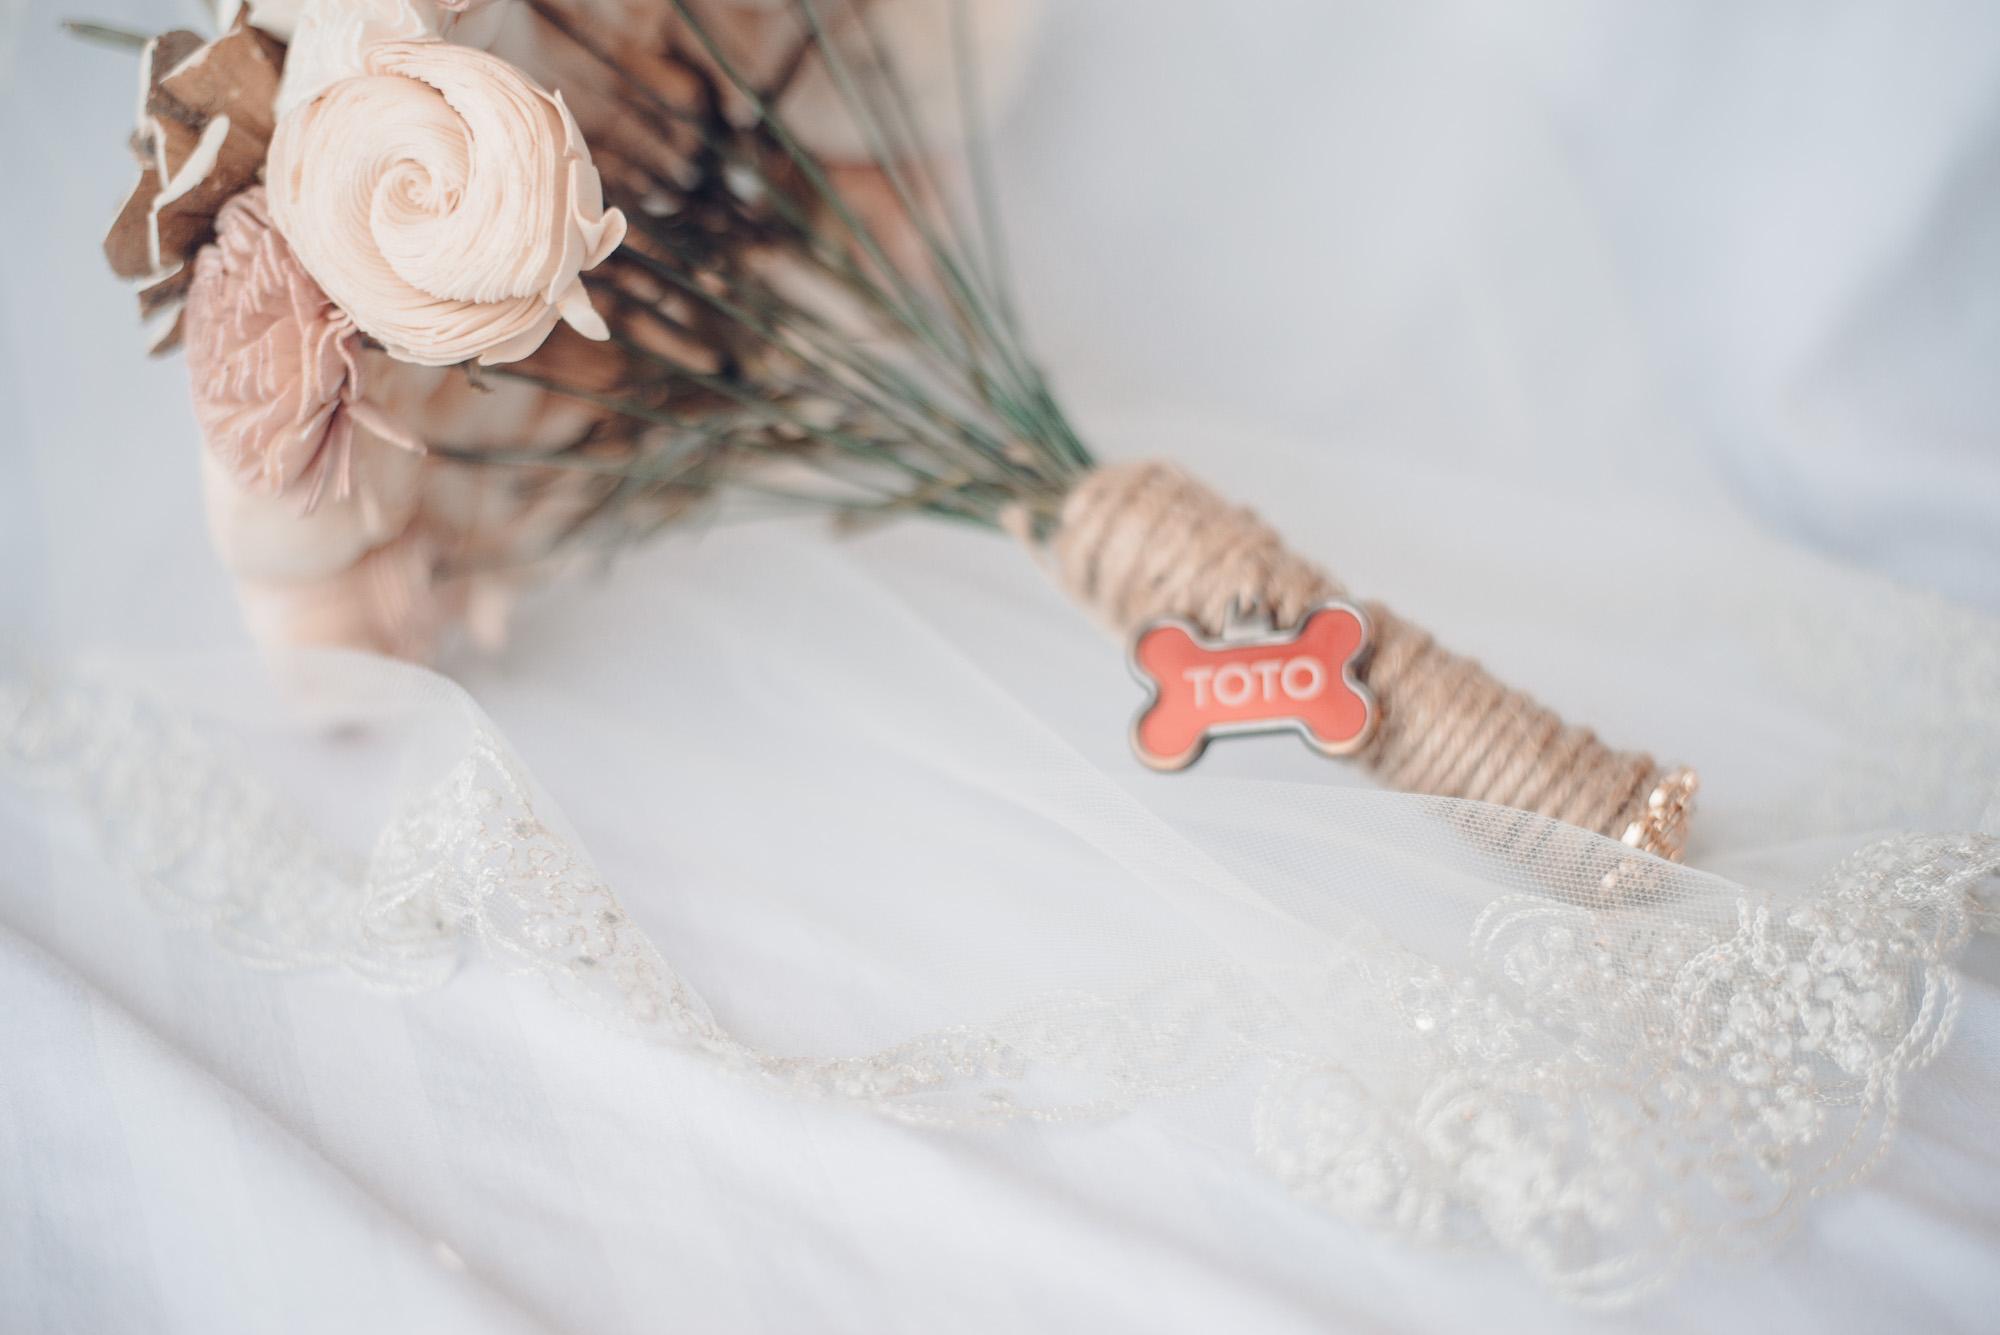 woodwinds_wedding_171020_web-7.jpg